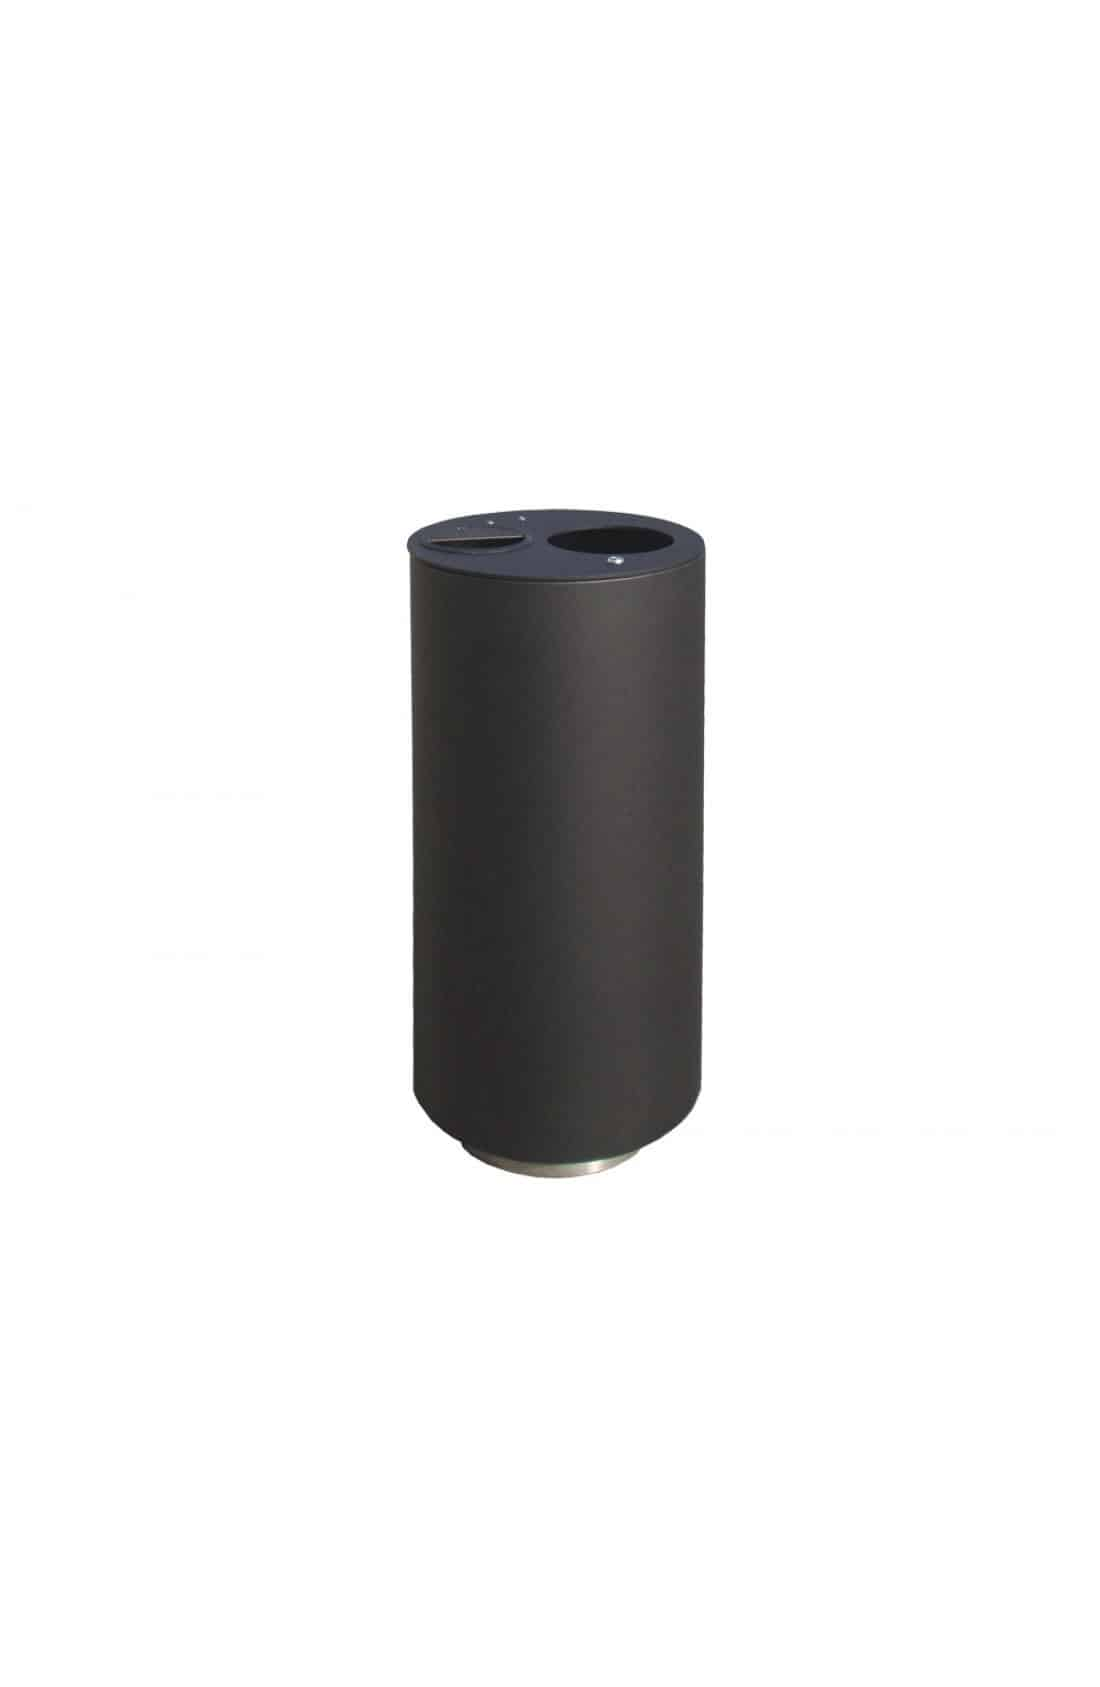 Mülleimer Dubai Produktbild